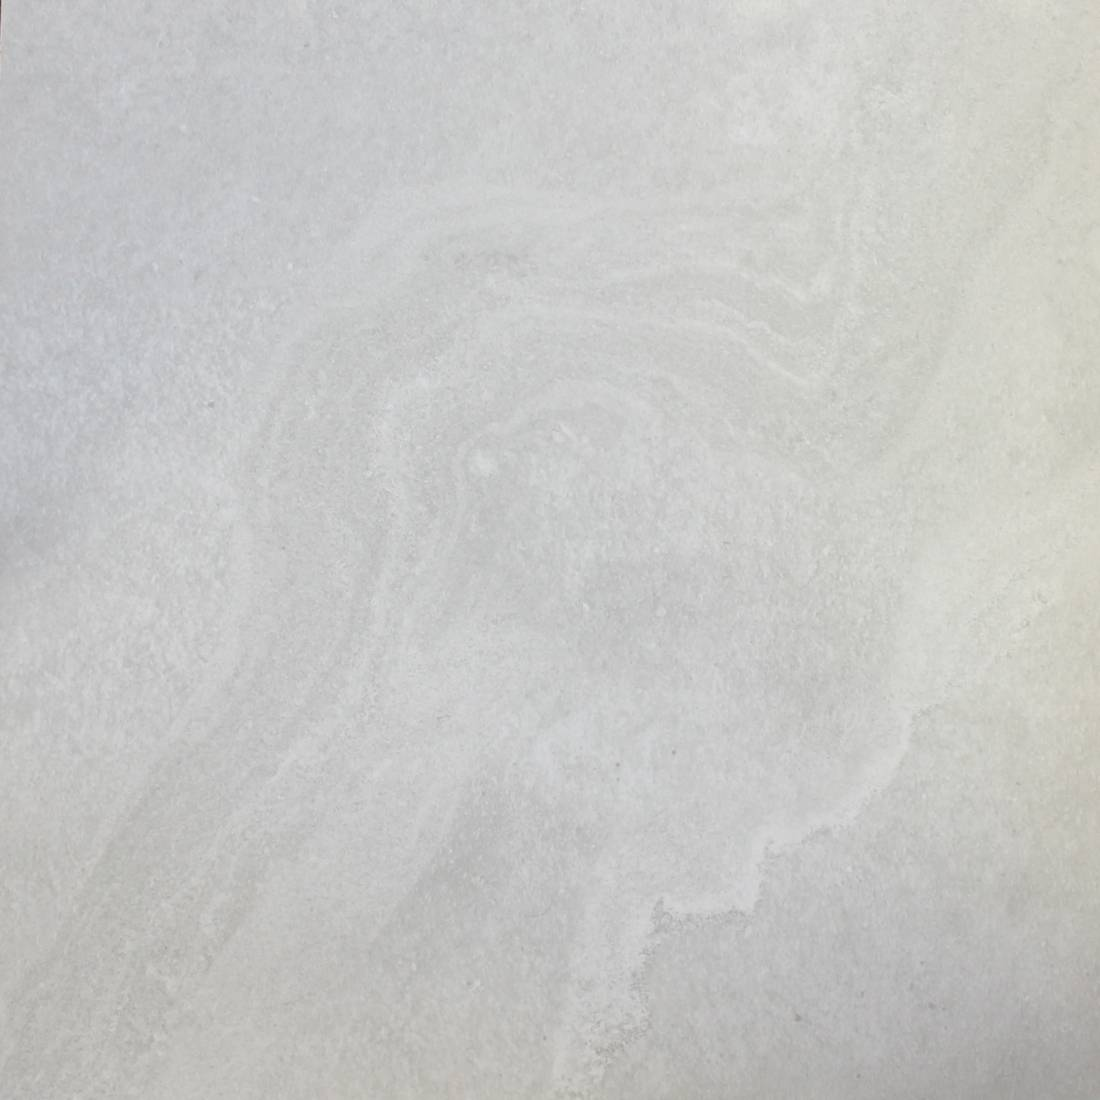 Highstone 60x60 Bianco 1